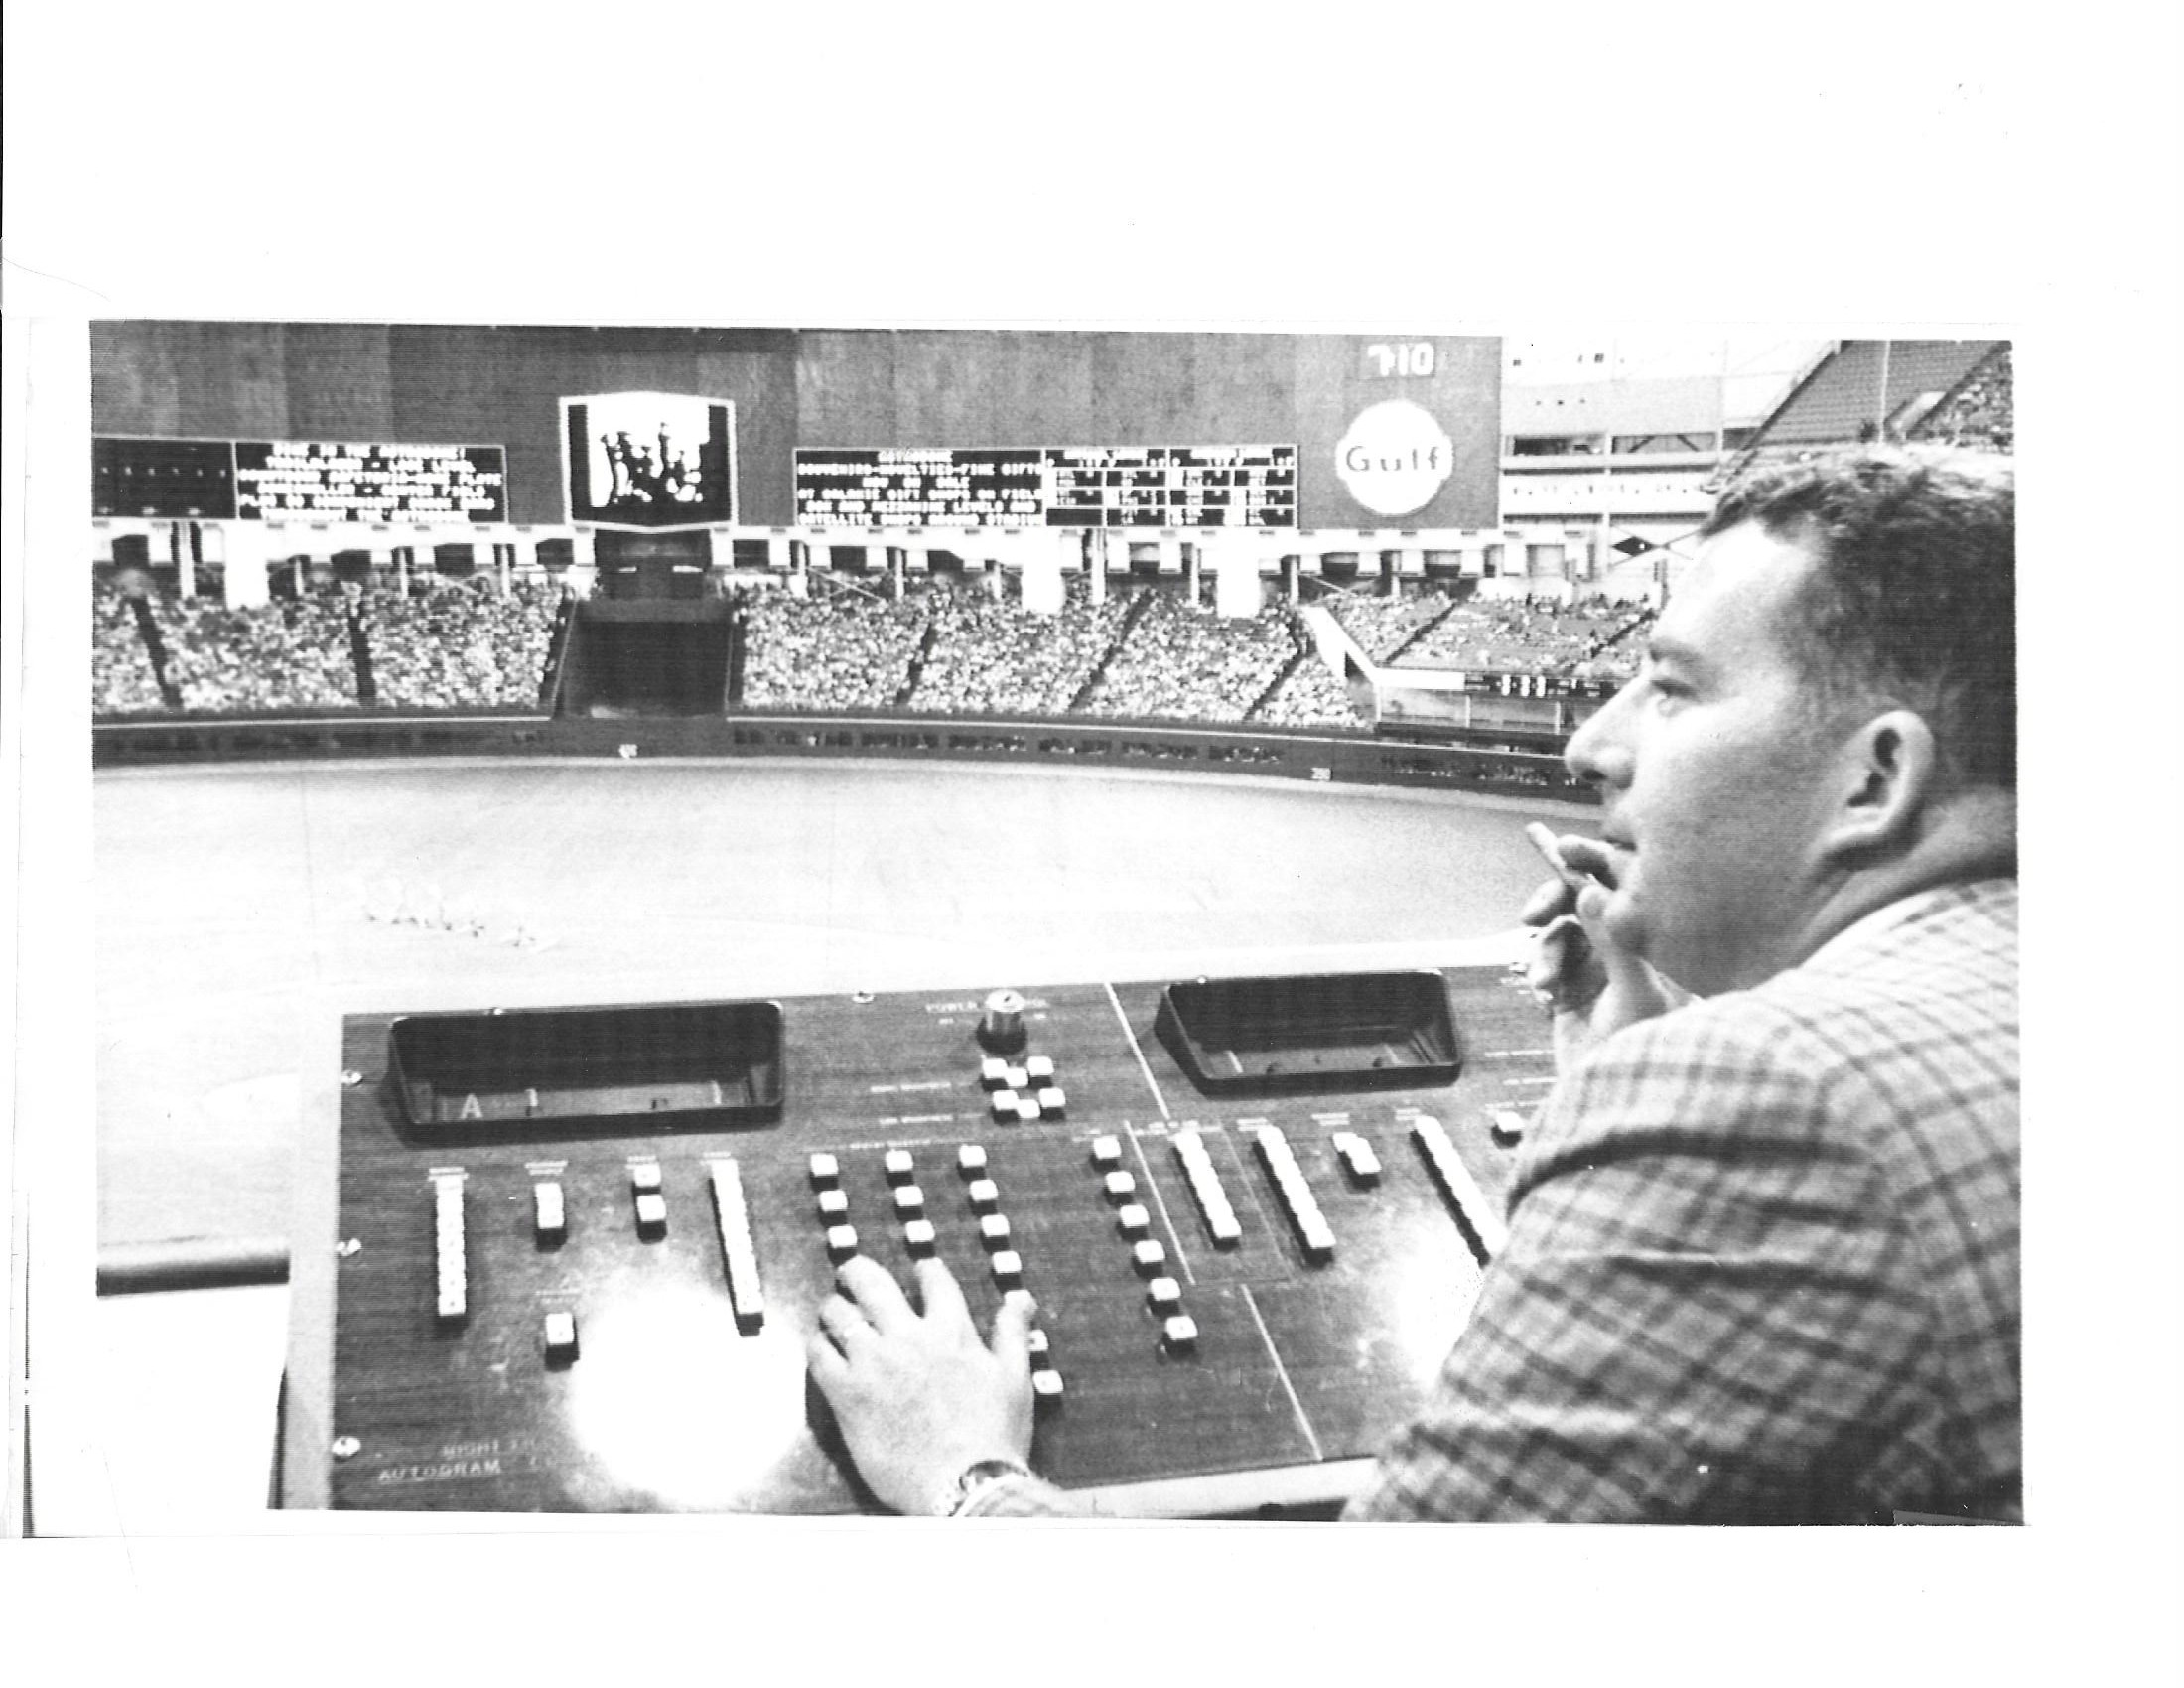 Bill Giles with scoreboard